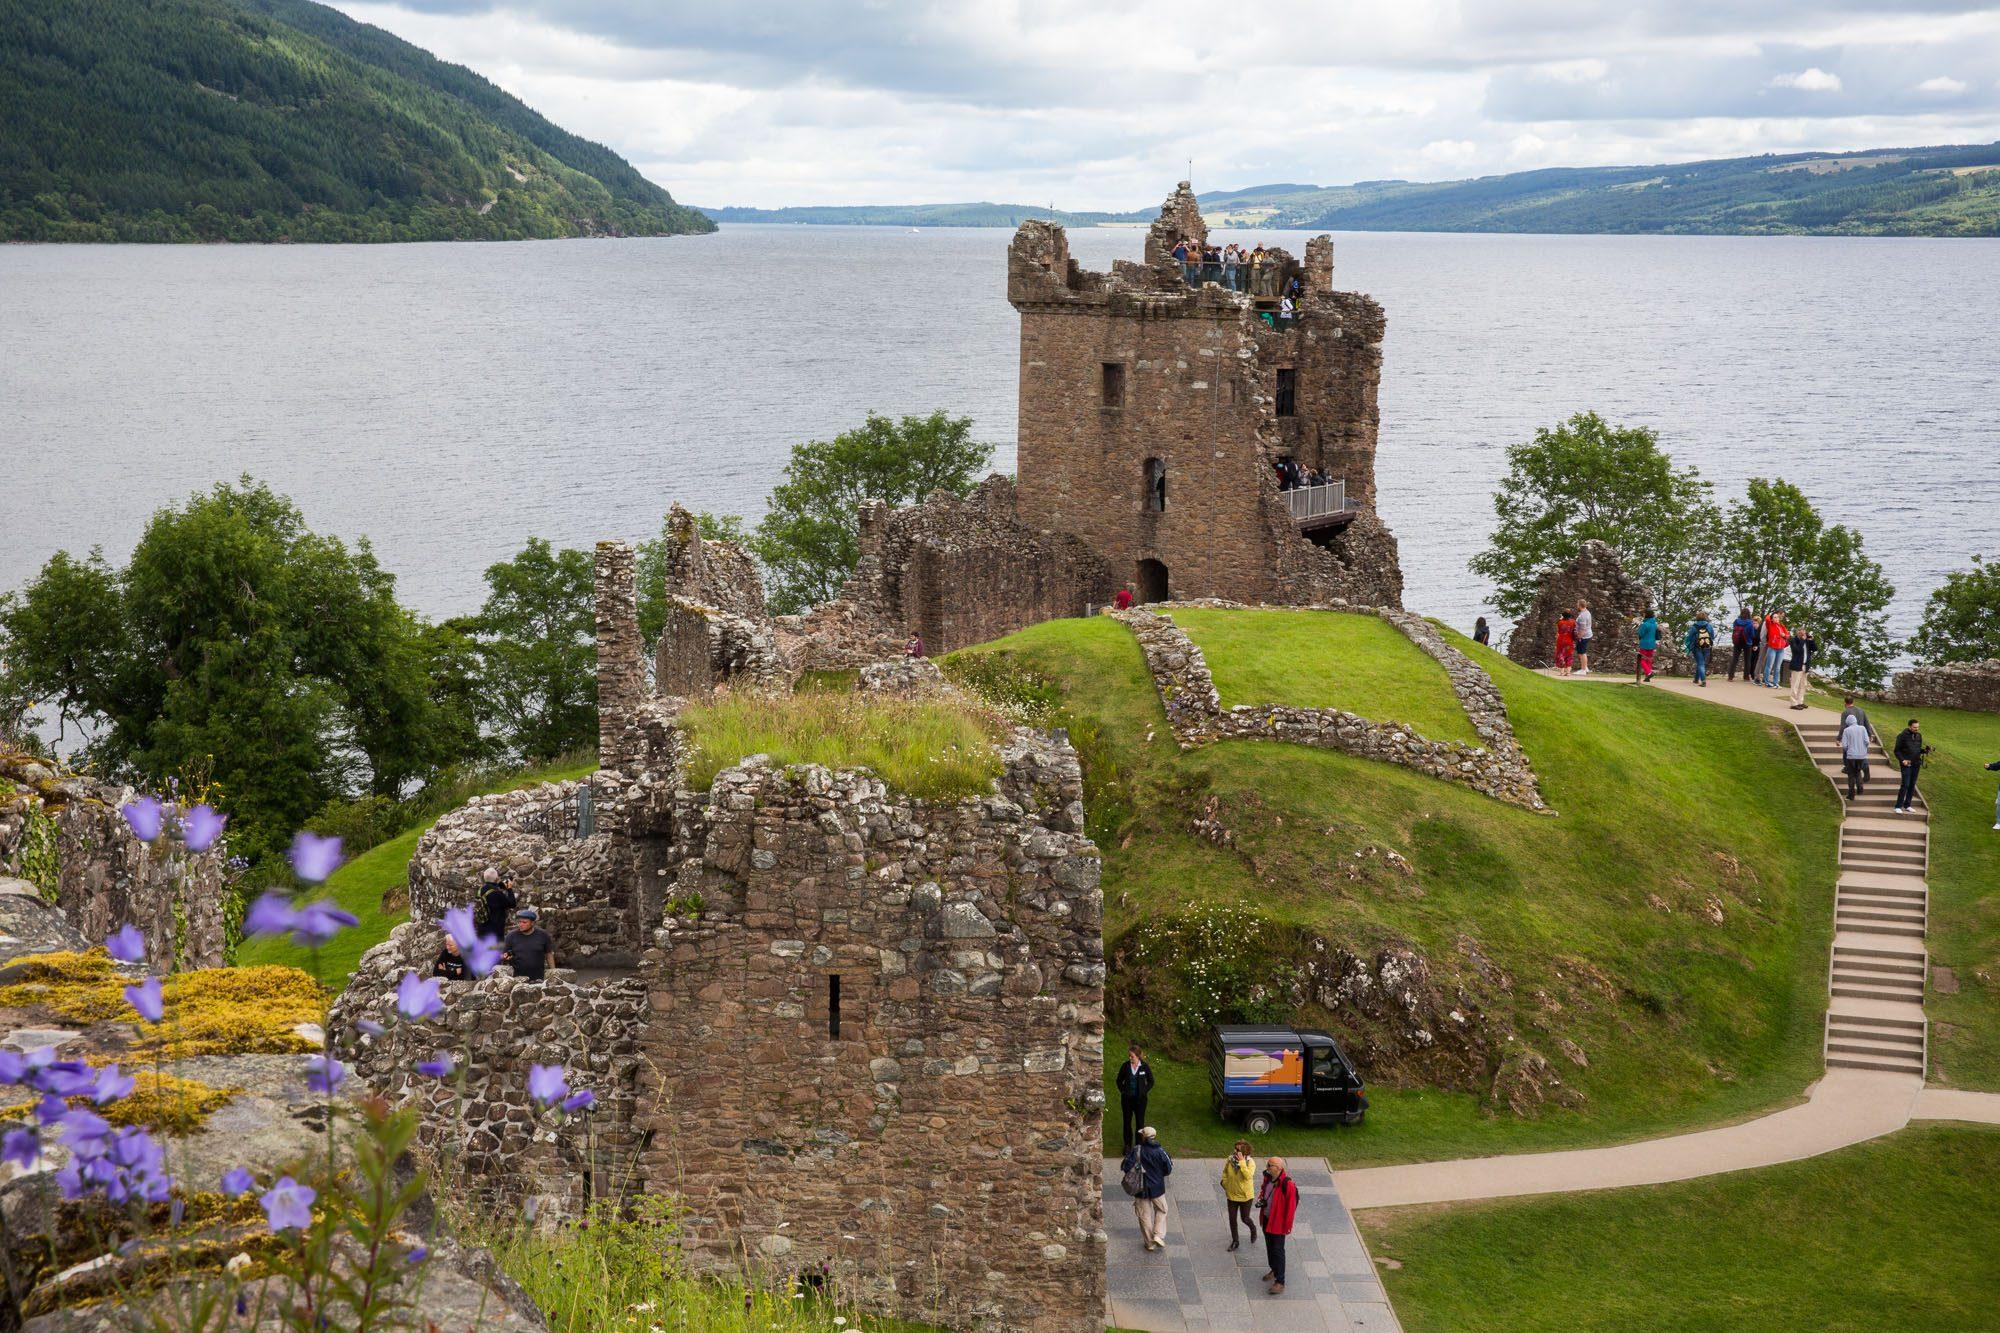 Is Loch Ness worth it